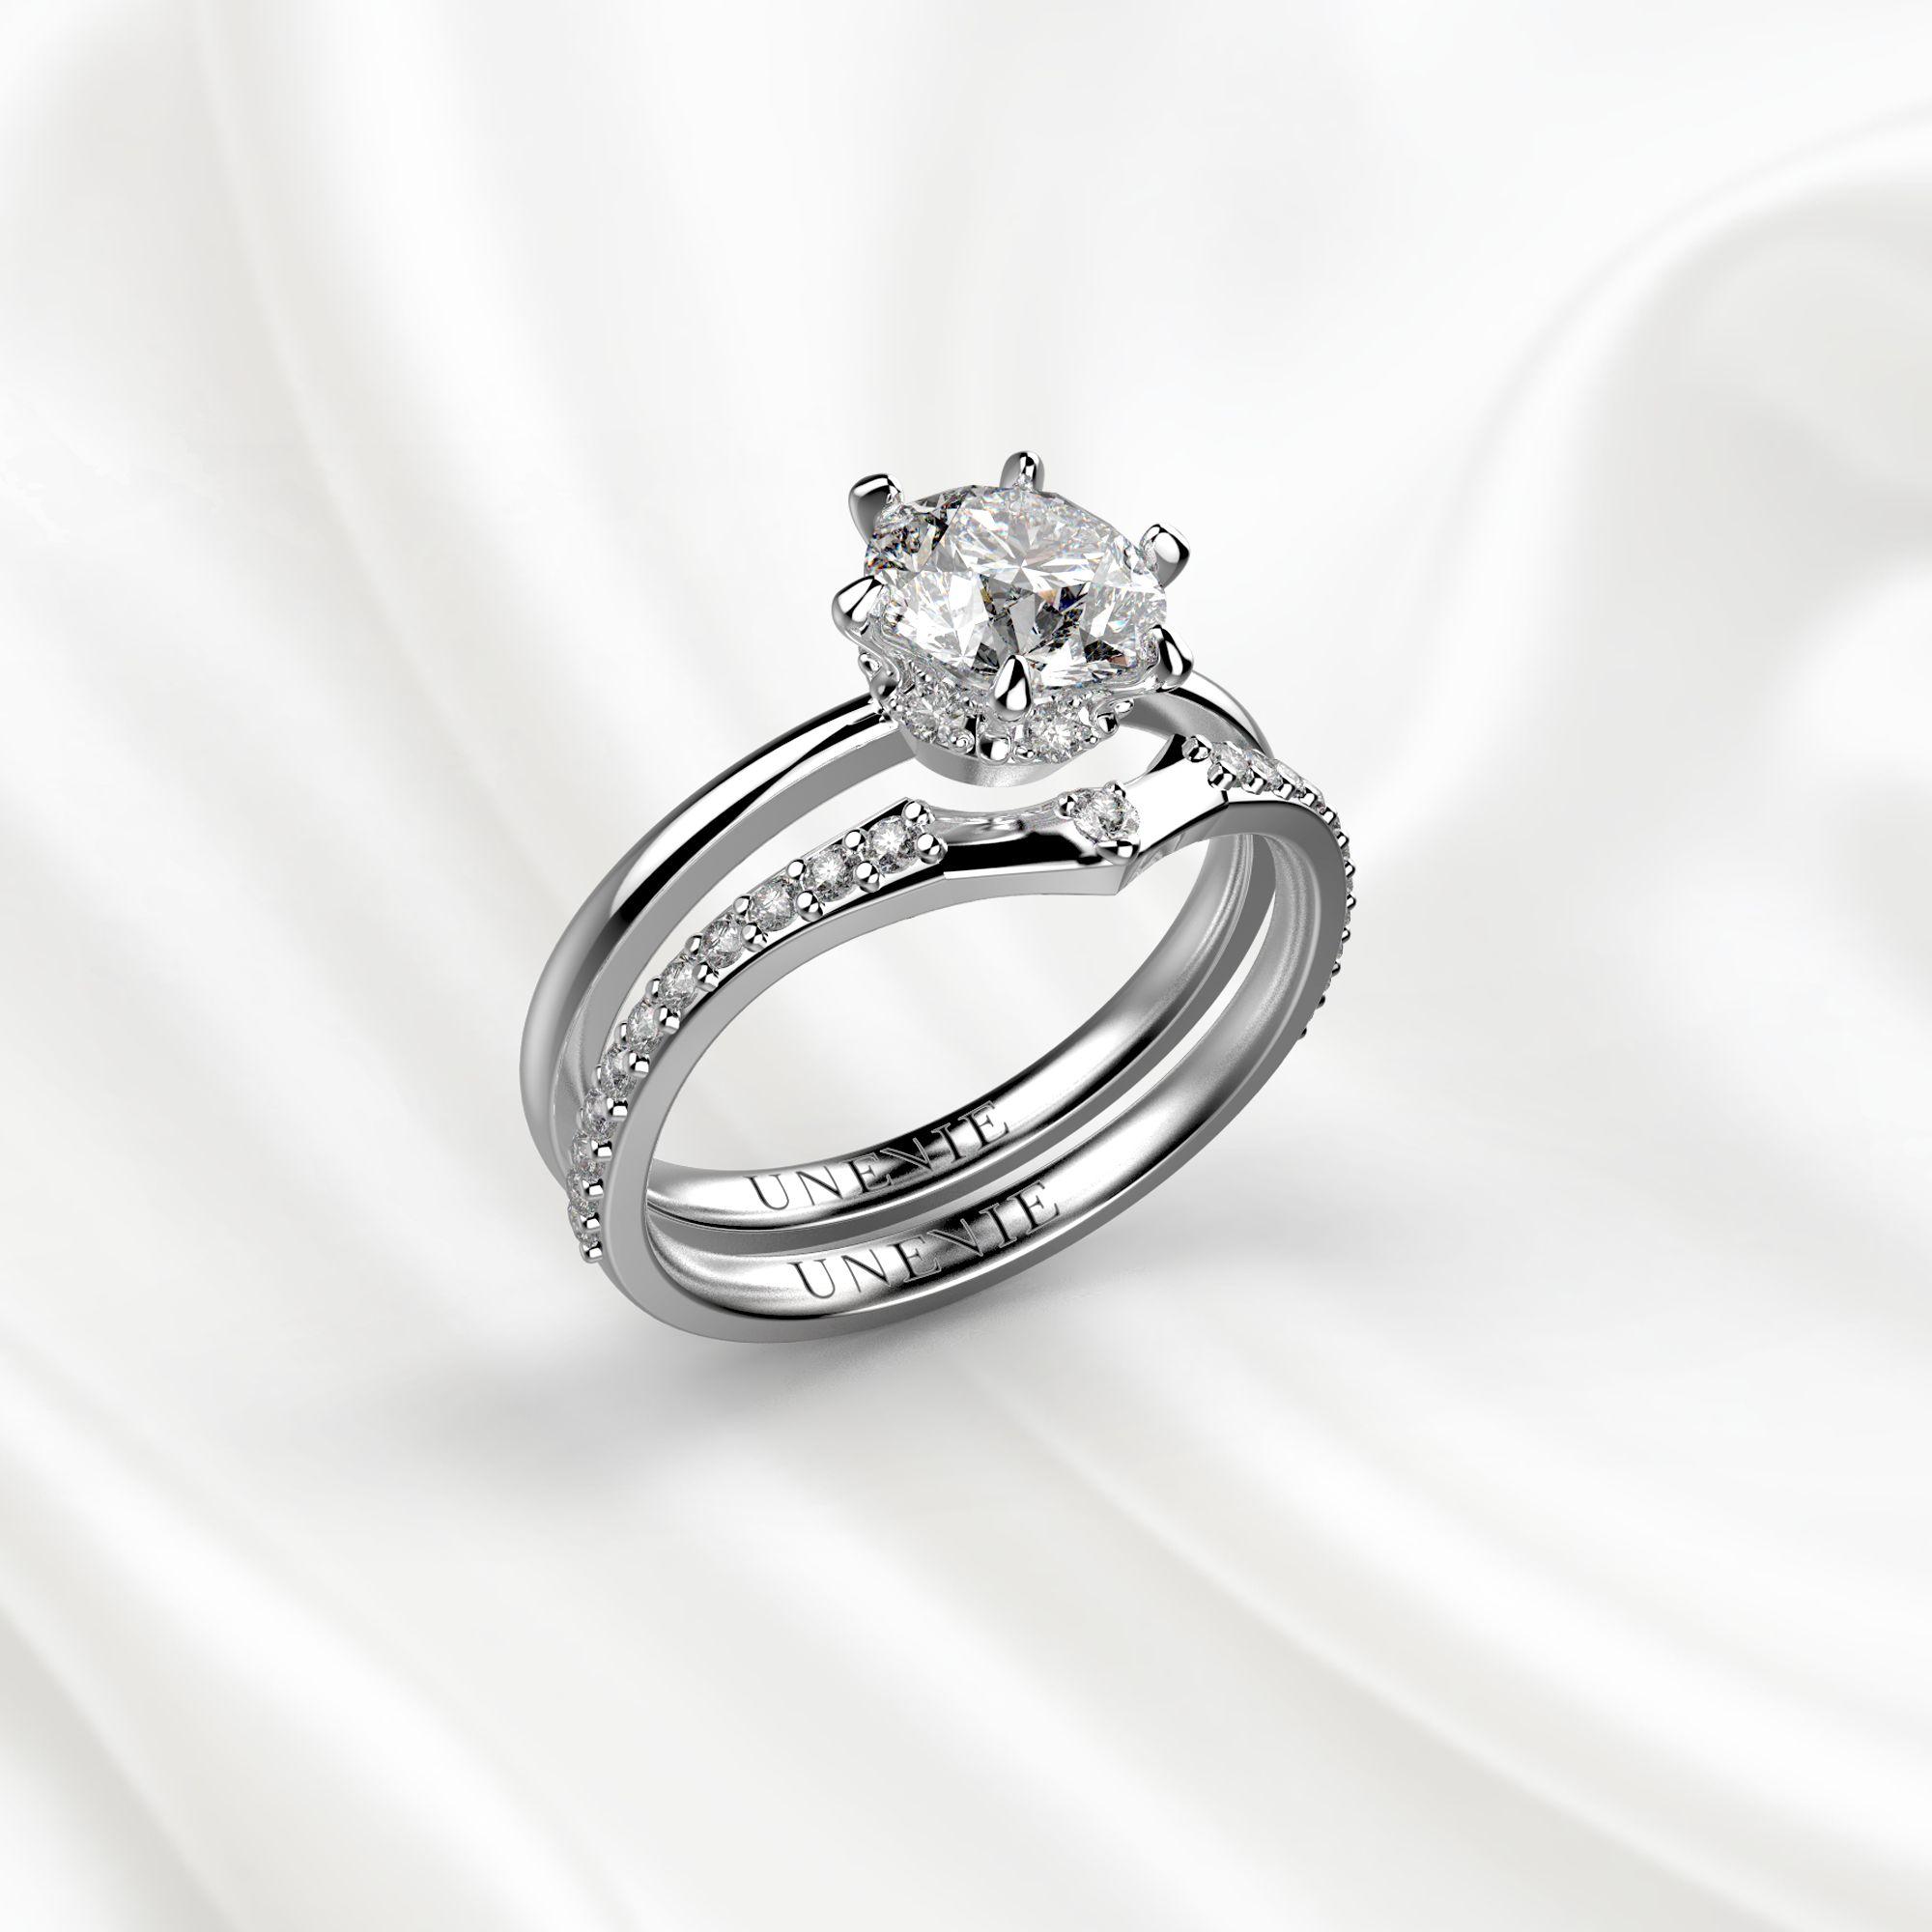 N3 Сет колец для помолвки из белого золота с бриллиантом 0.8 карат